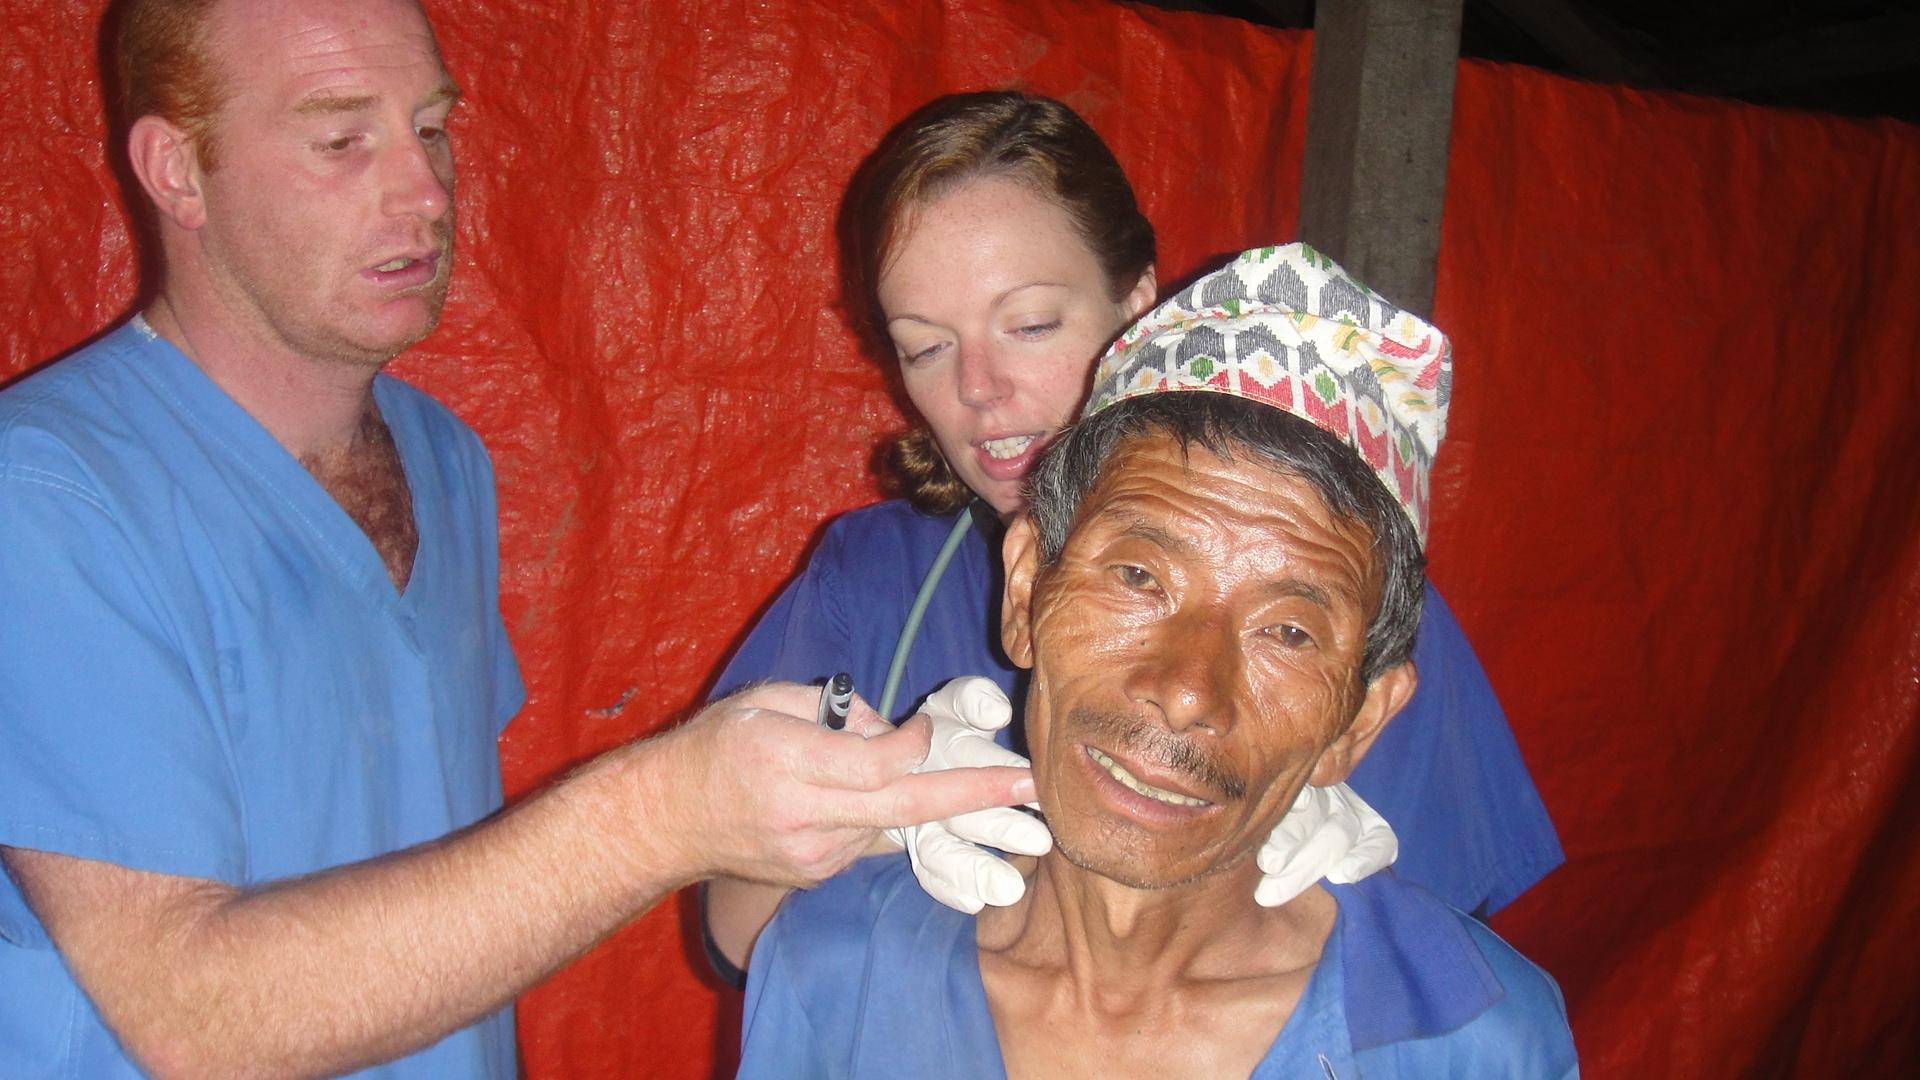 Free_Medical_Camp_Adventure_Alternative_Nepal.JPG